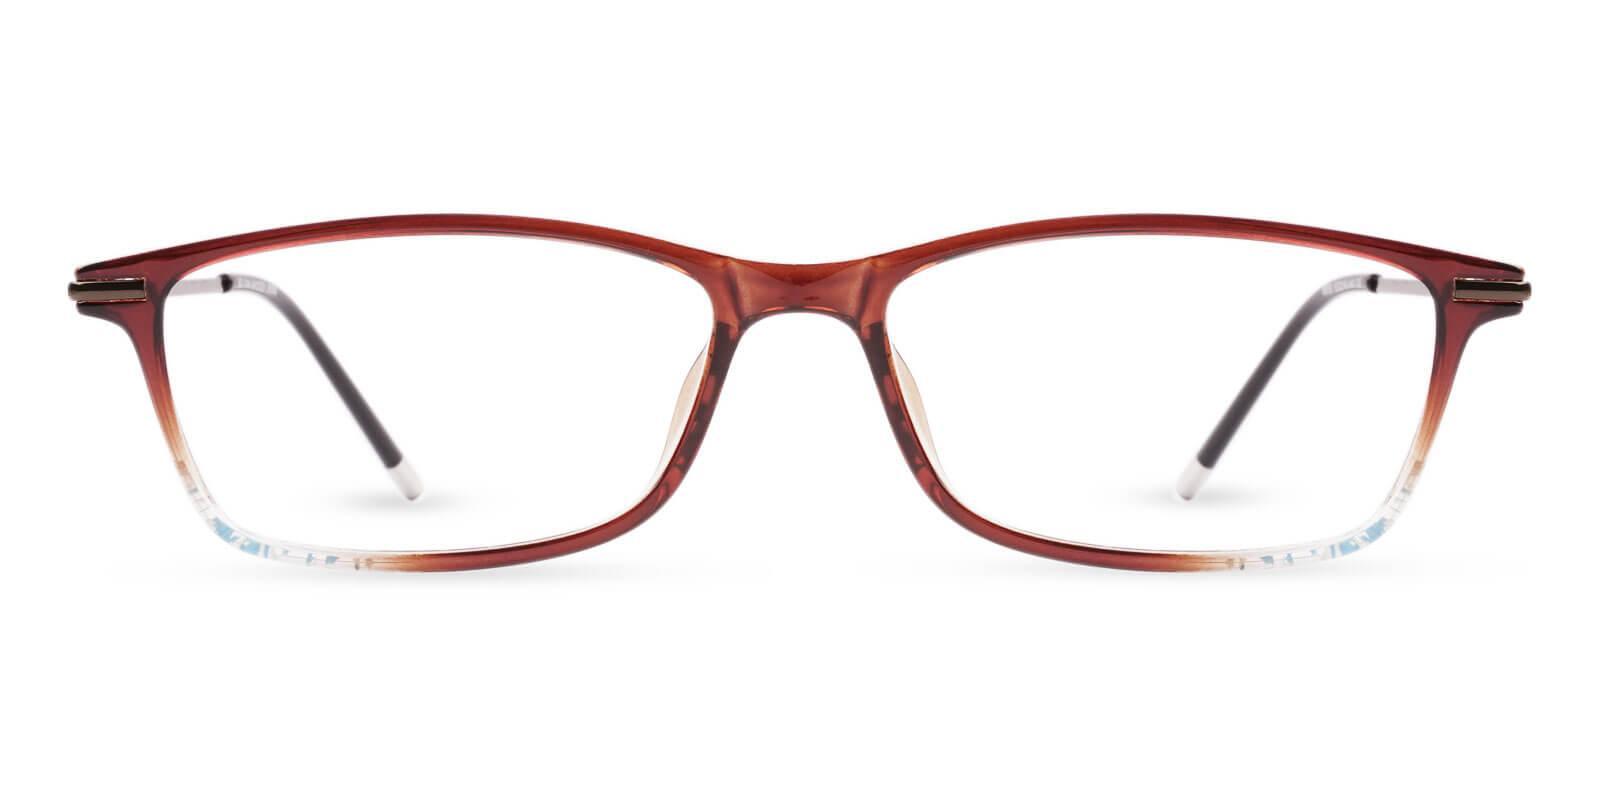 Radcliffe Brown TR Eyeglasses , Lightweight , UniversalBridgeFit Frames from ABBE Glasses